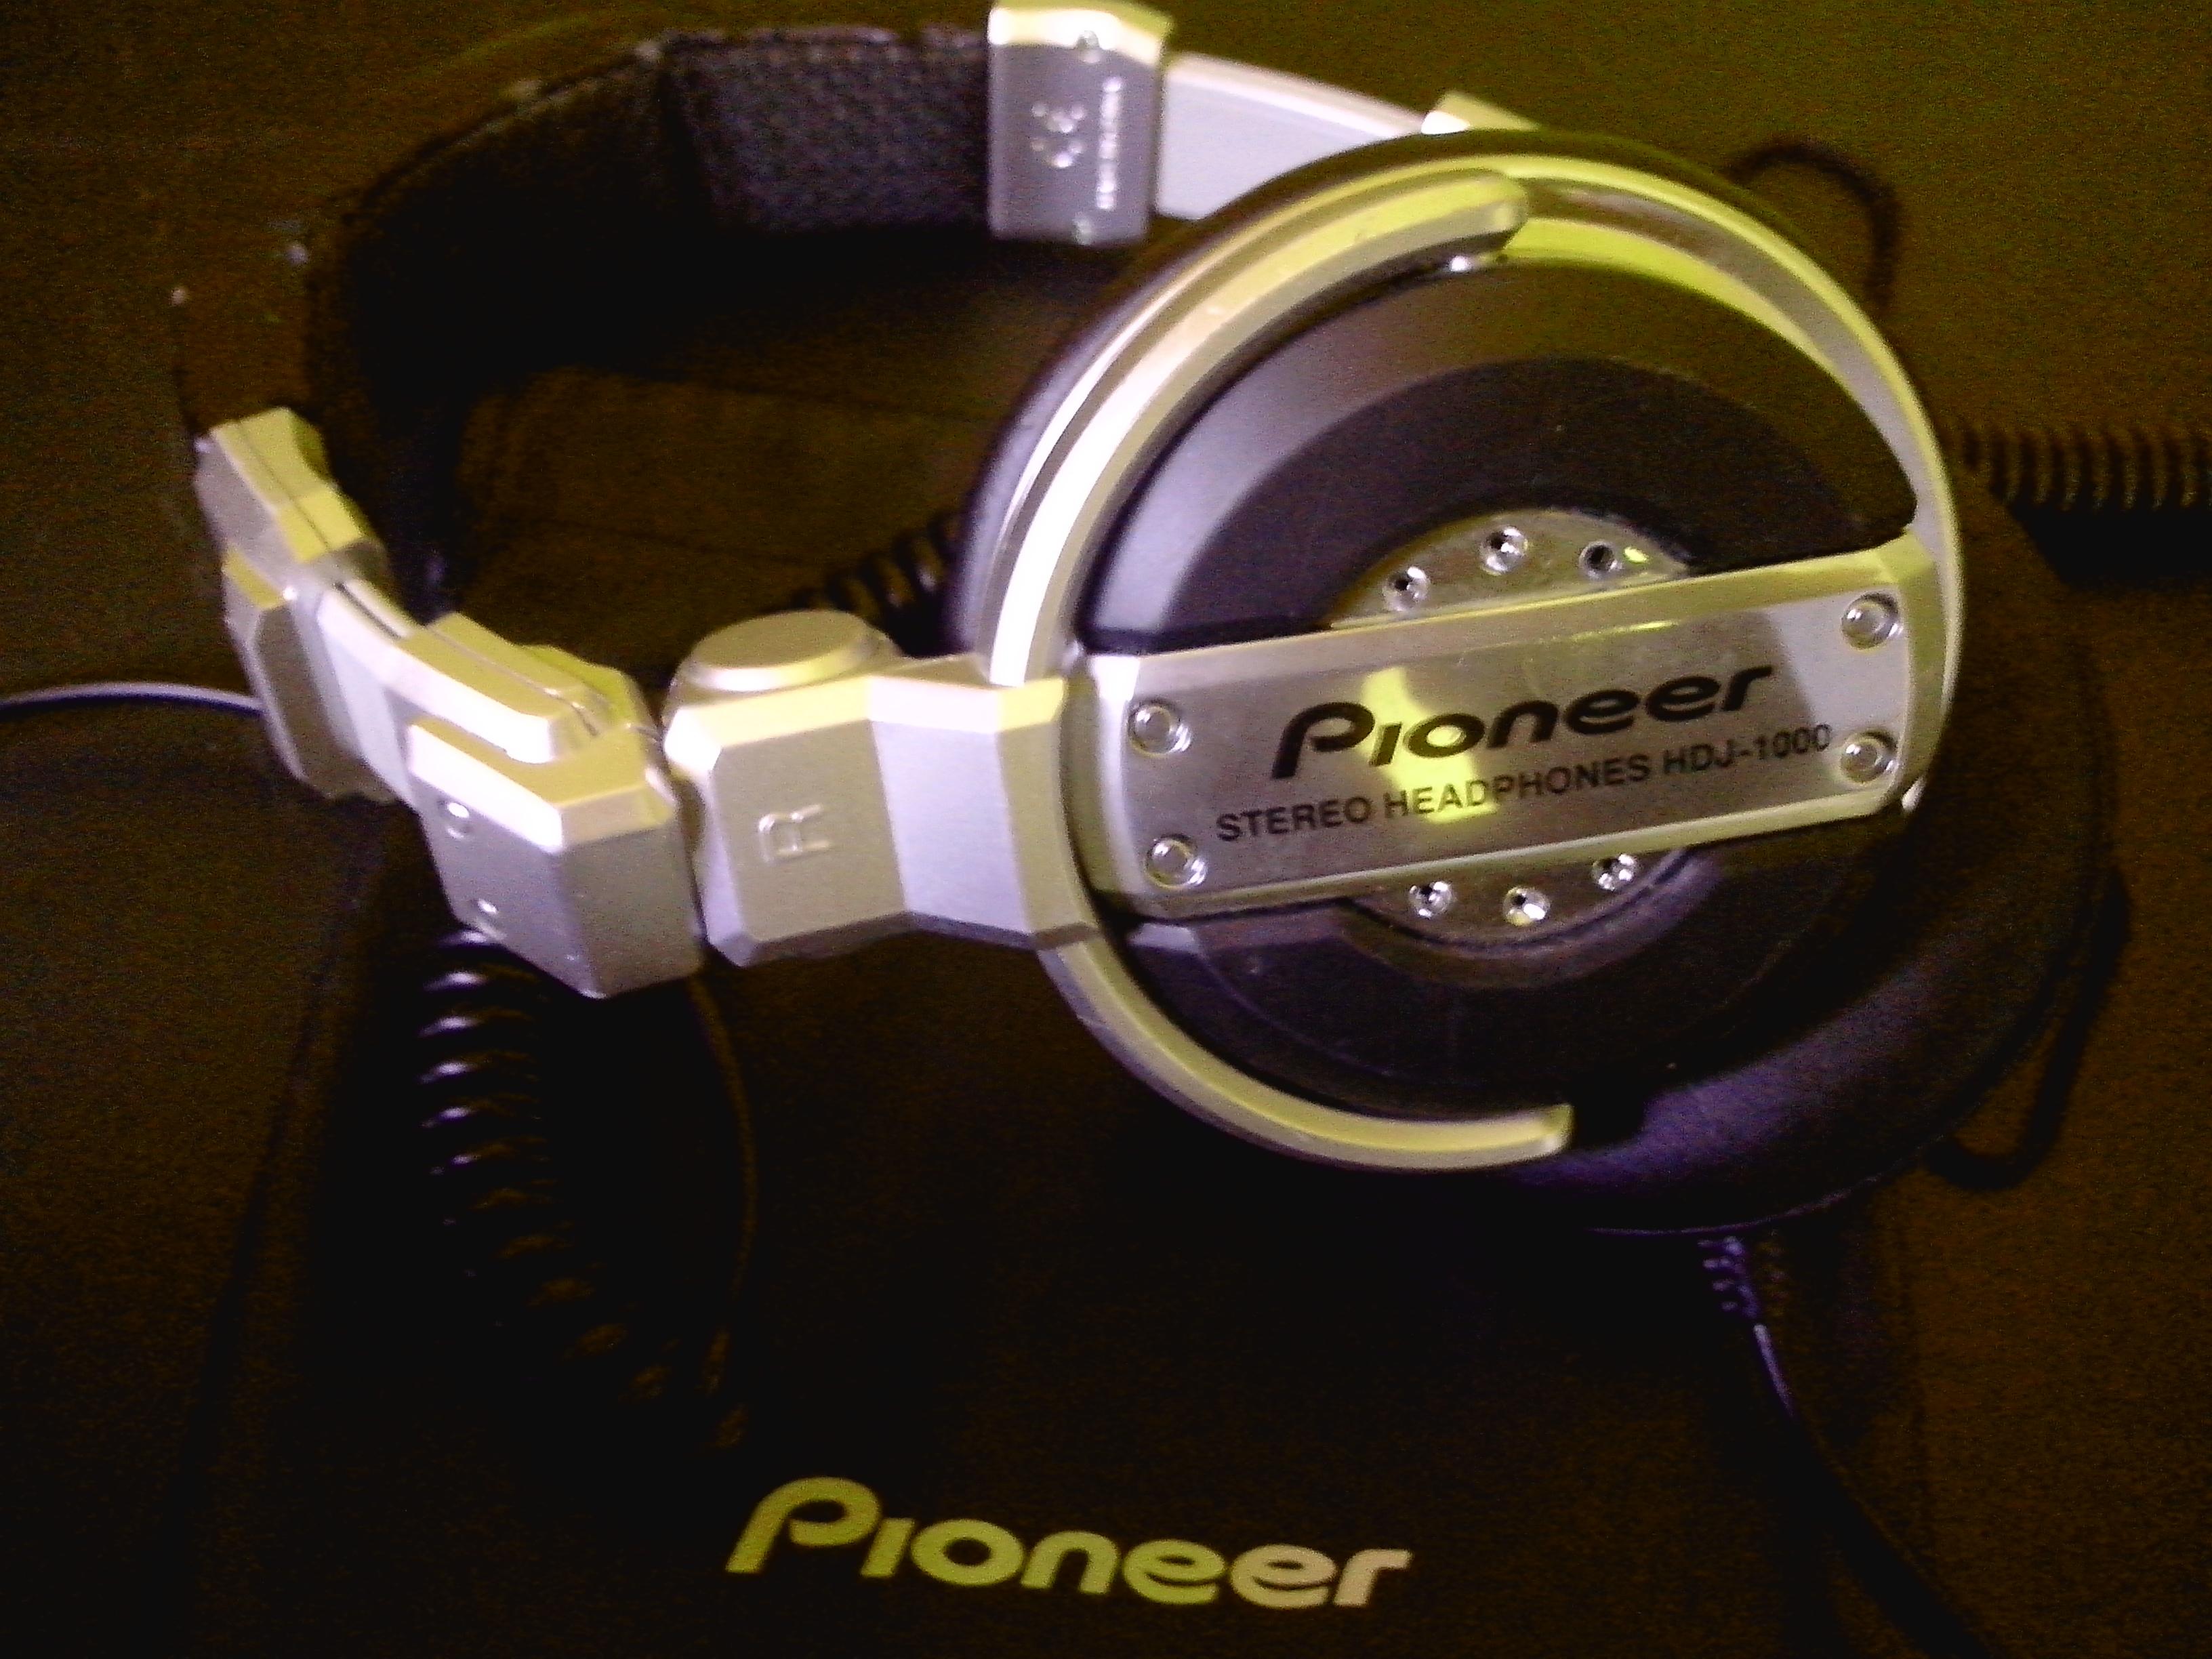 casque dj pro pioneer hdj 1000 ile de france audiofanzine. Black Bedroom Furniture Sets. Home Design Ideas